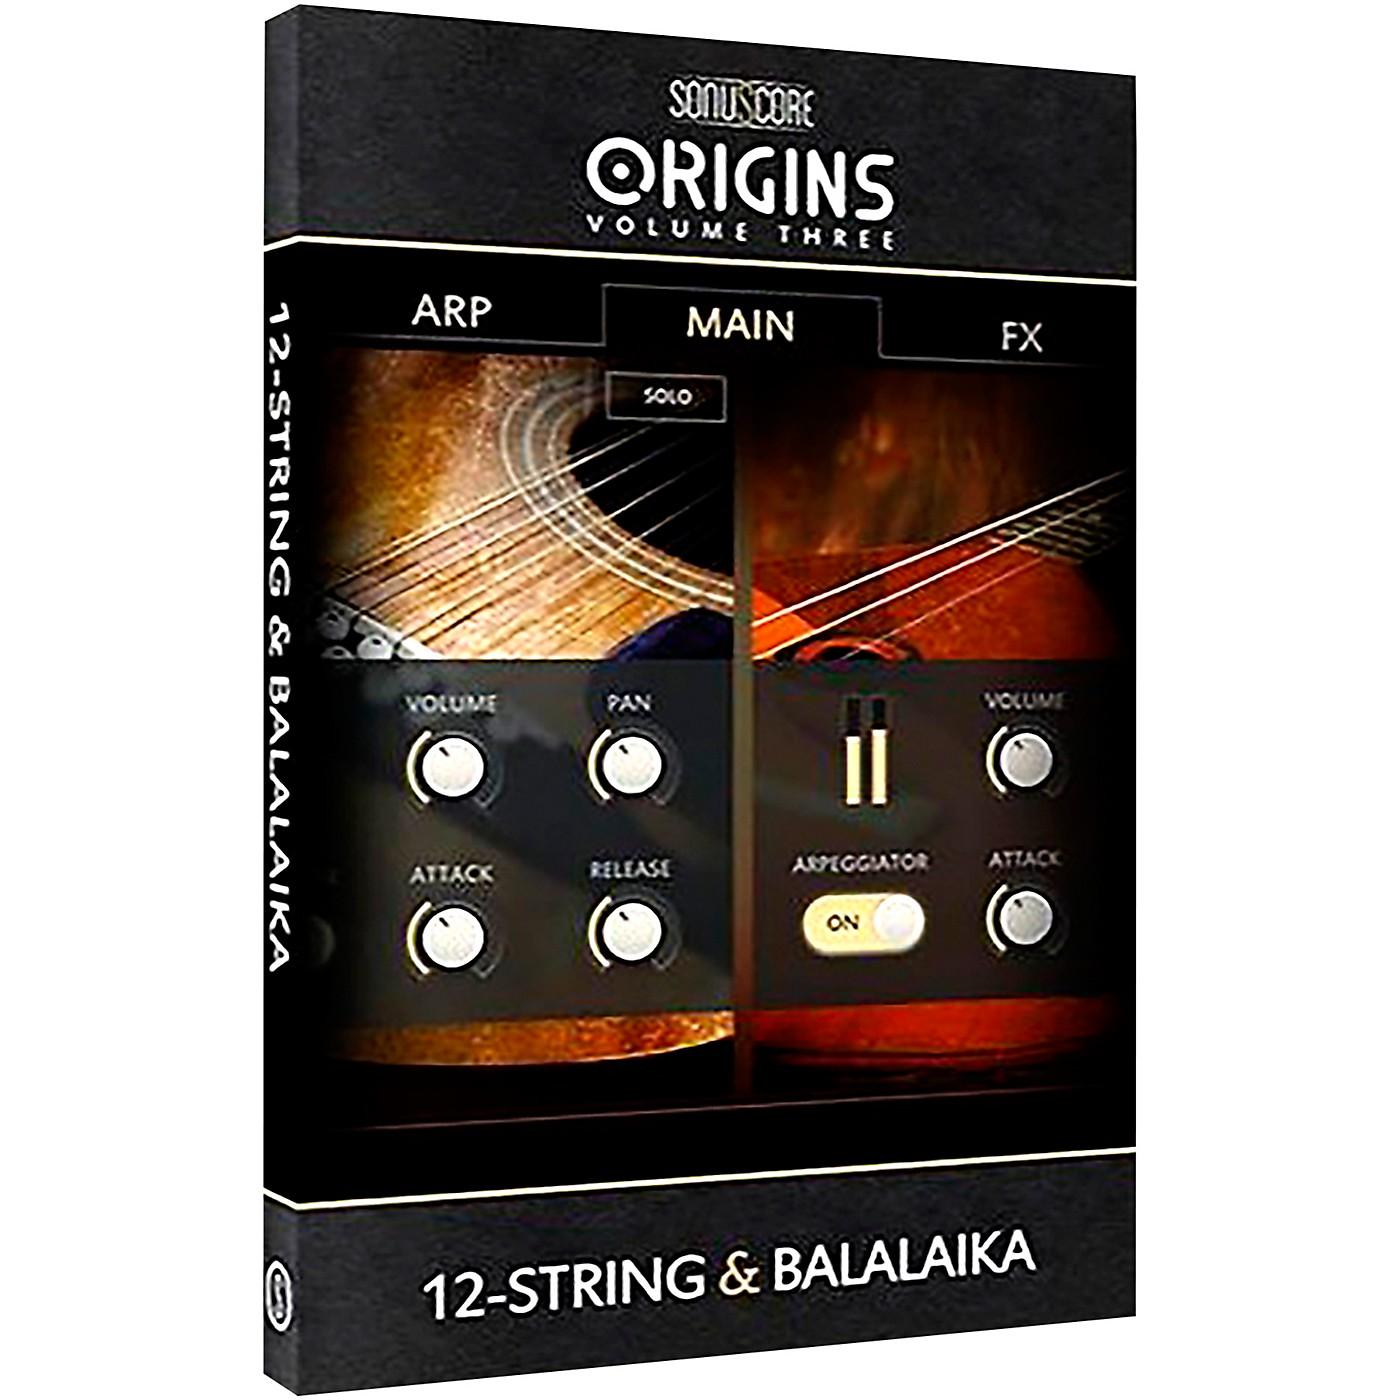 Sonuscore Origins Series Vol. 3 12-String and Balalaika thumbnail